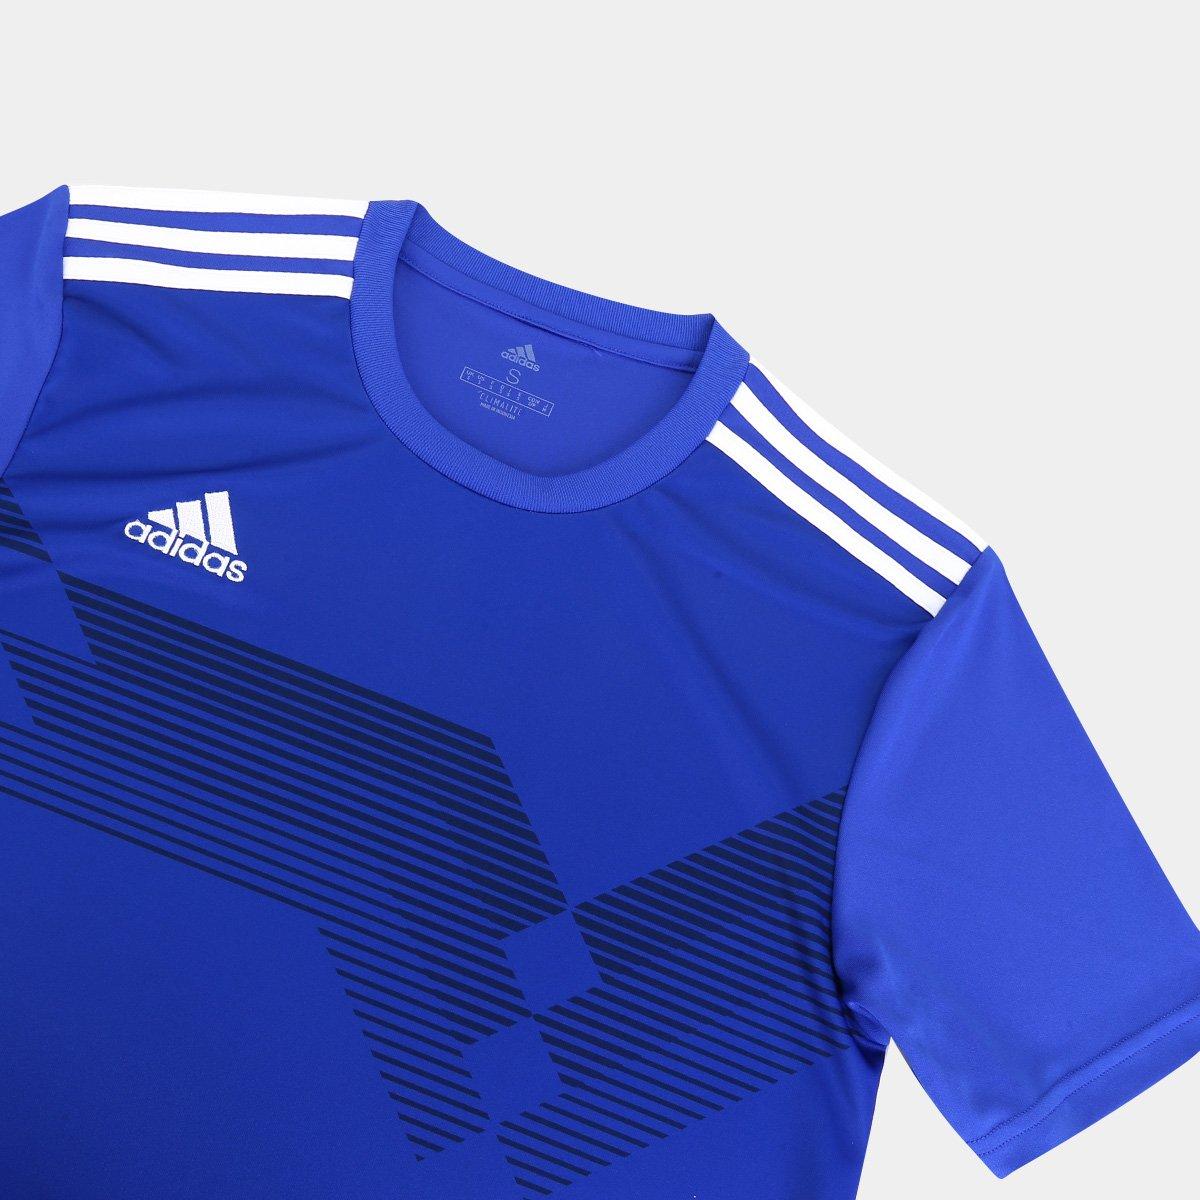 Innecesario claridad Leo un libro  Camisa Adidas Campeon 19 Masculina - Tam: P - Shopping TudoAzul